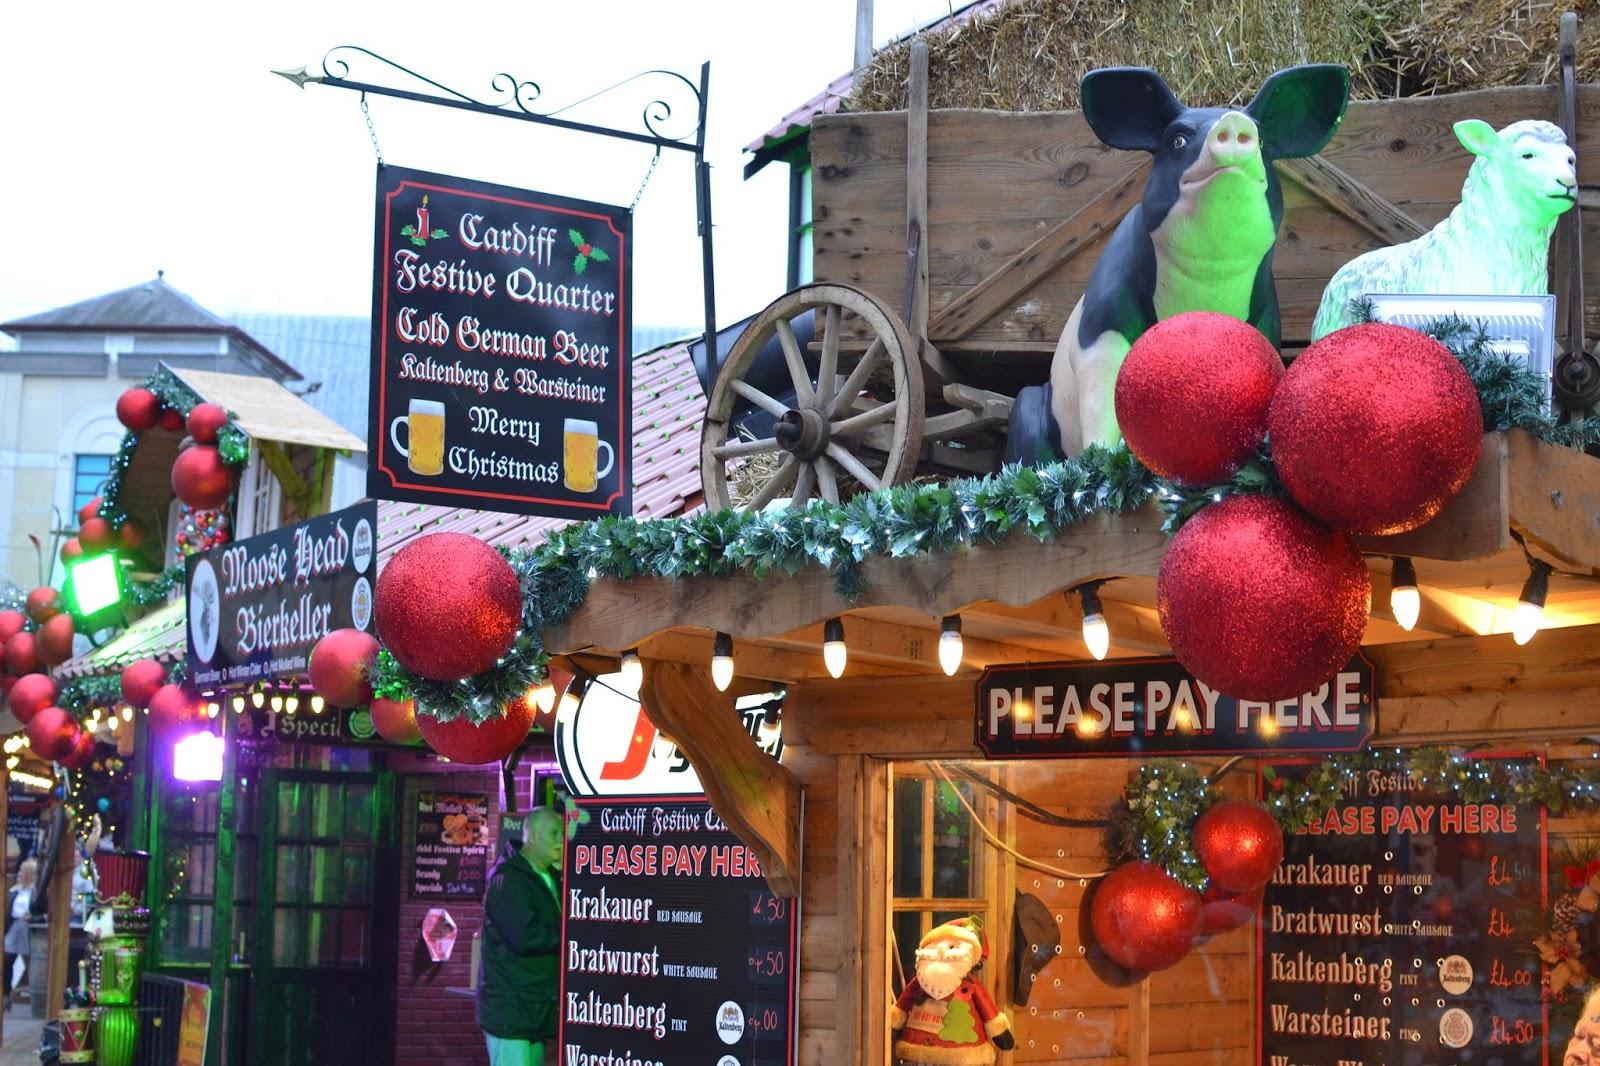 Cardiff Festive Quarter